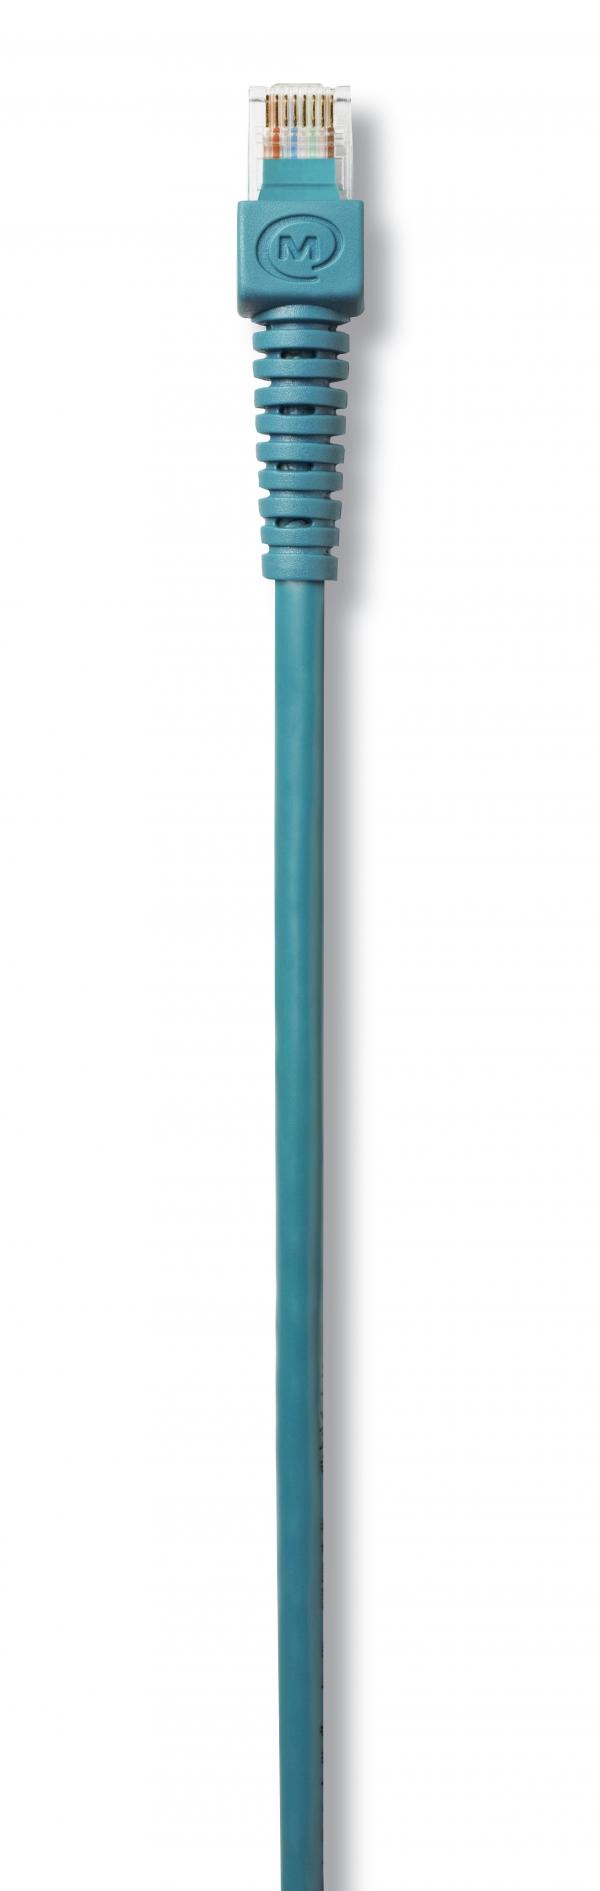 MasterBus cable, 0.5 metre